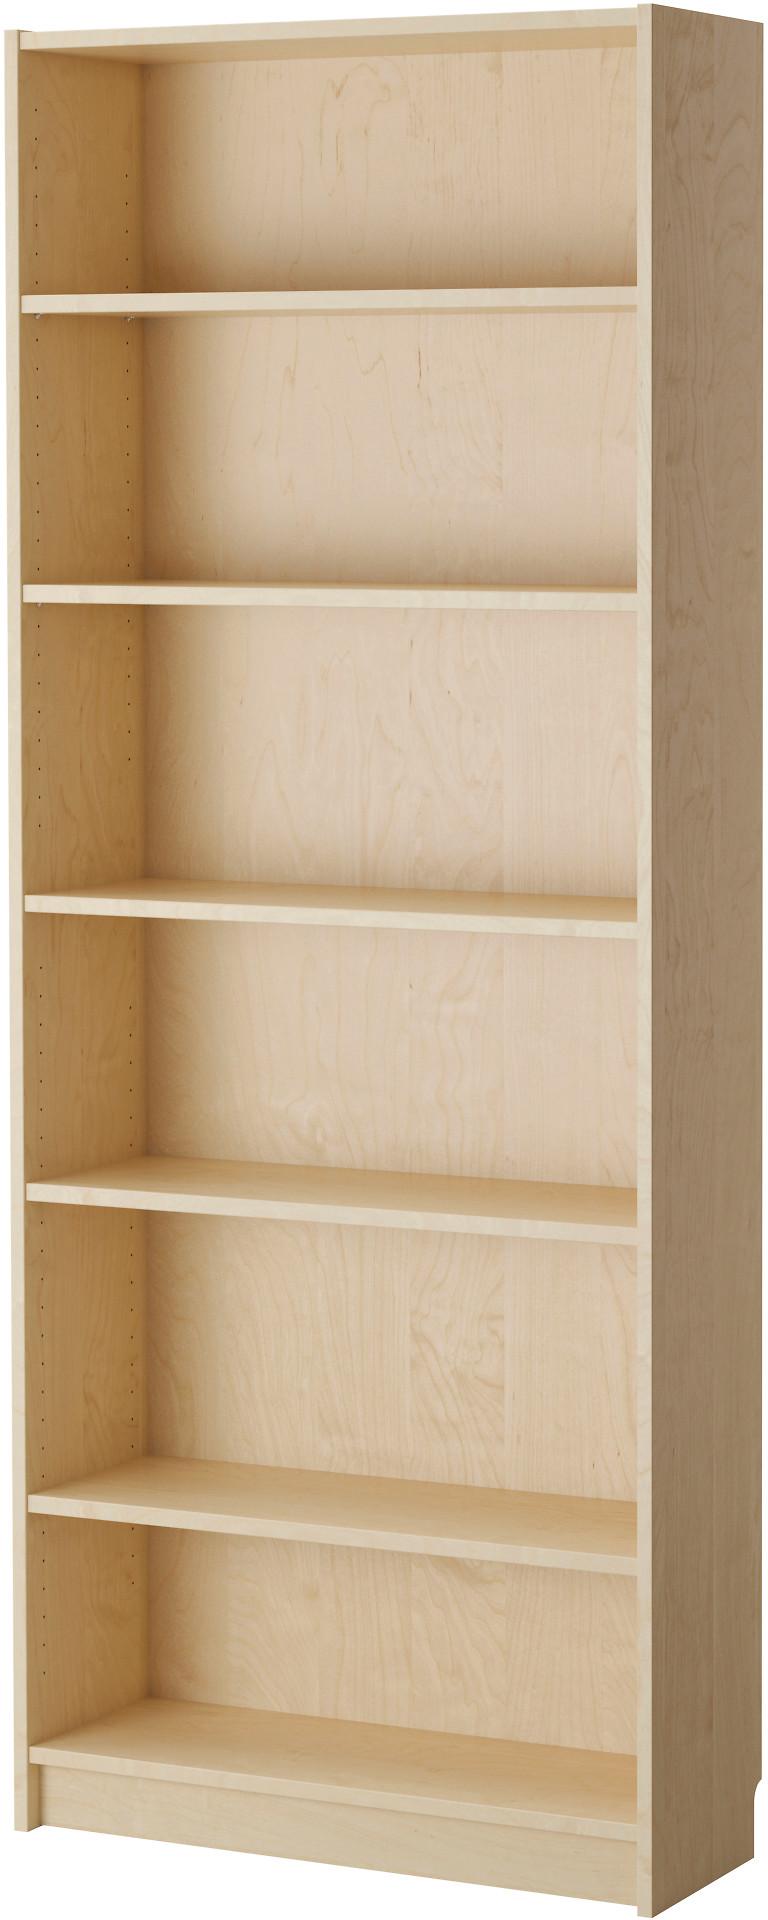 BILLY Bookcase - birch veneer - IKEA